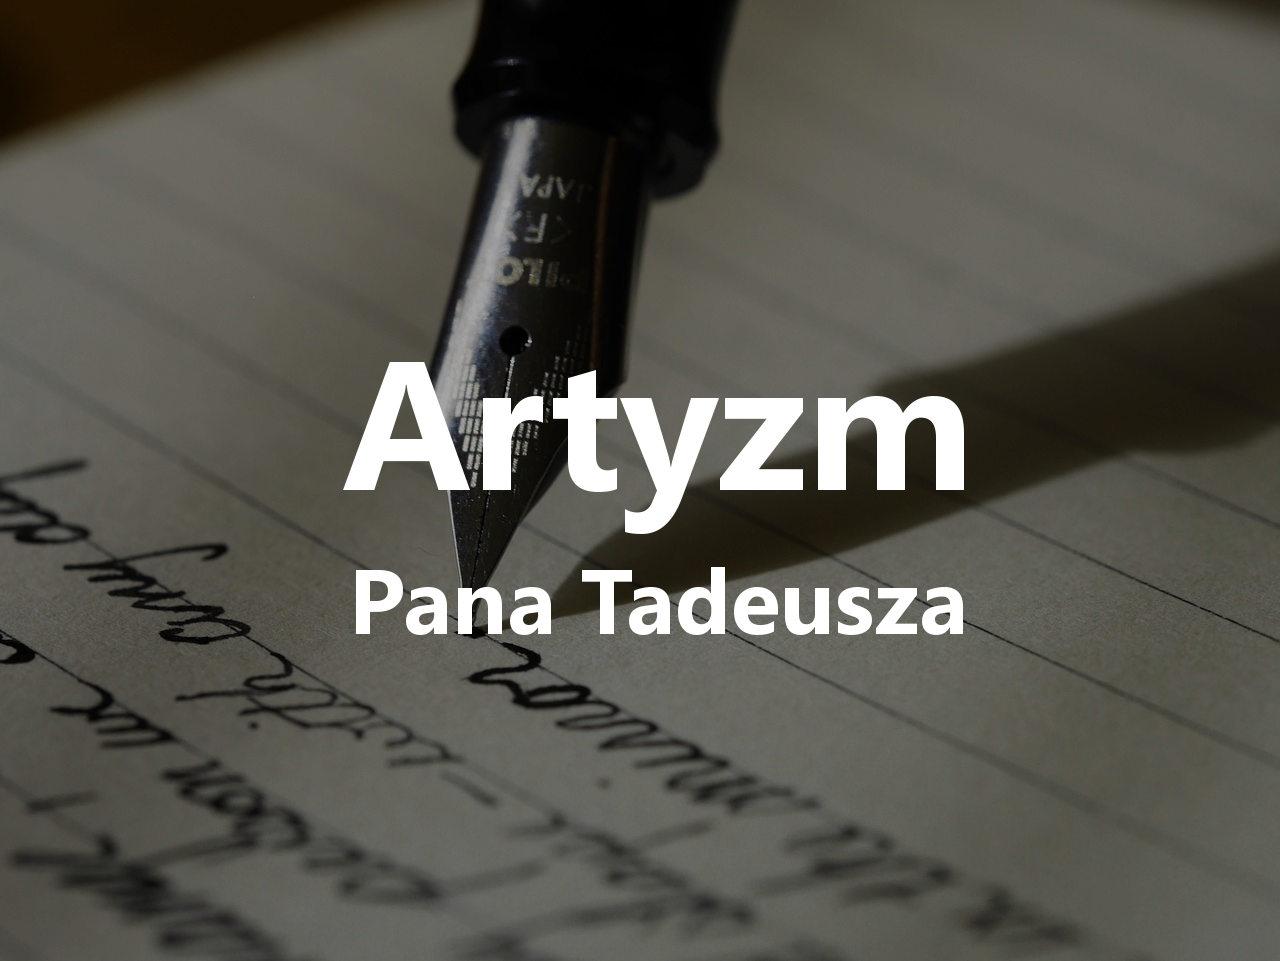 Artyzm Pana Tadeusza